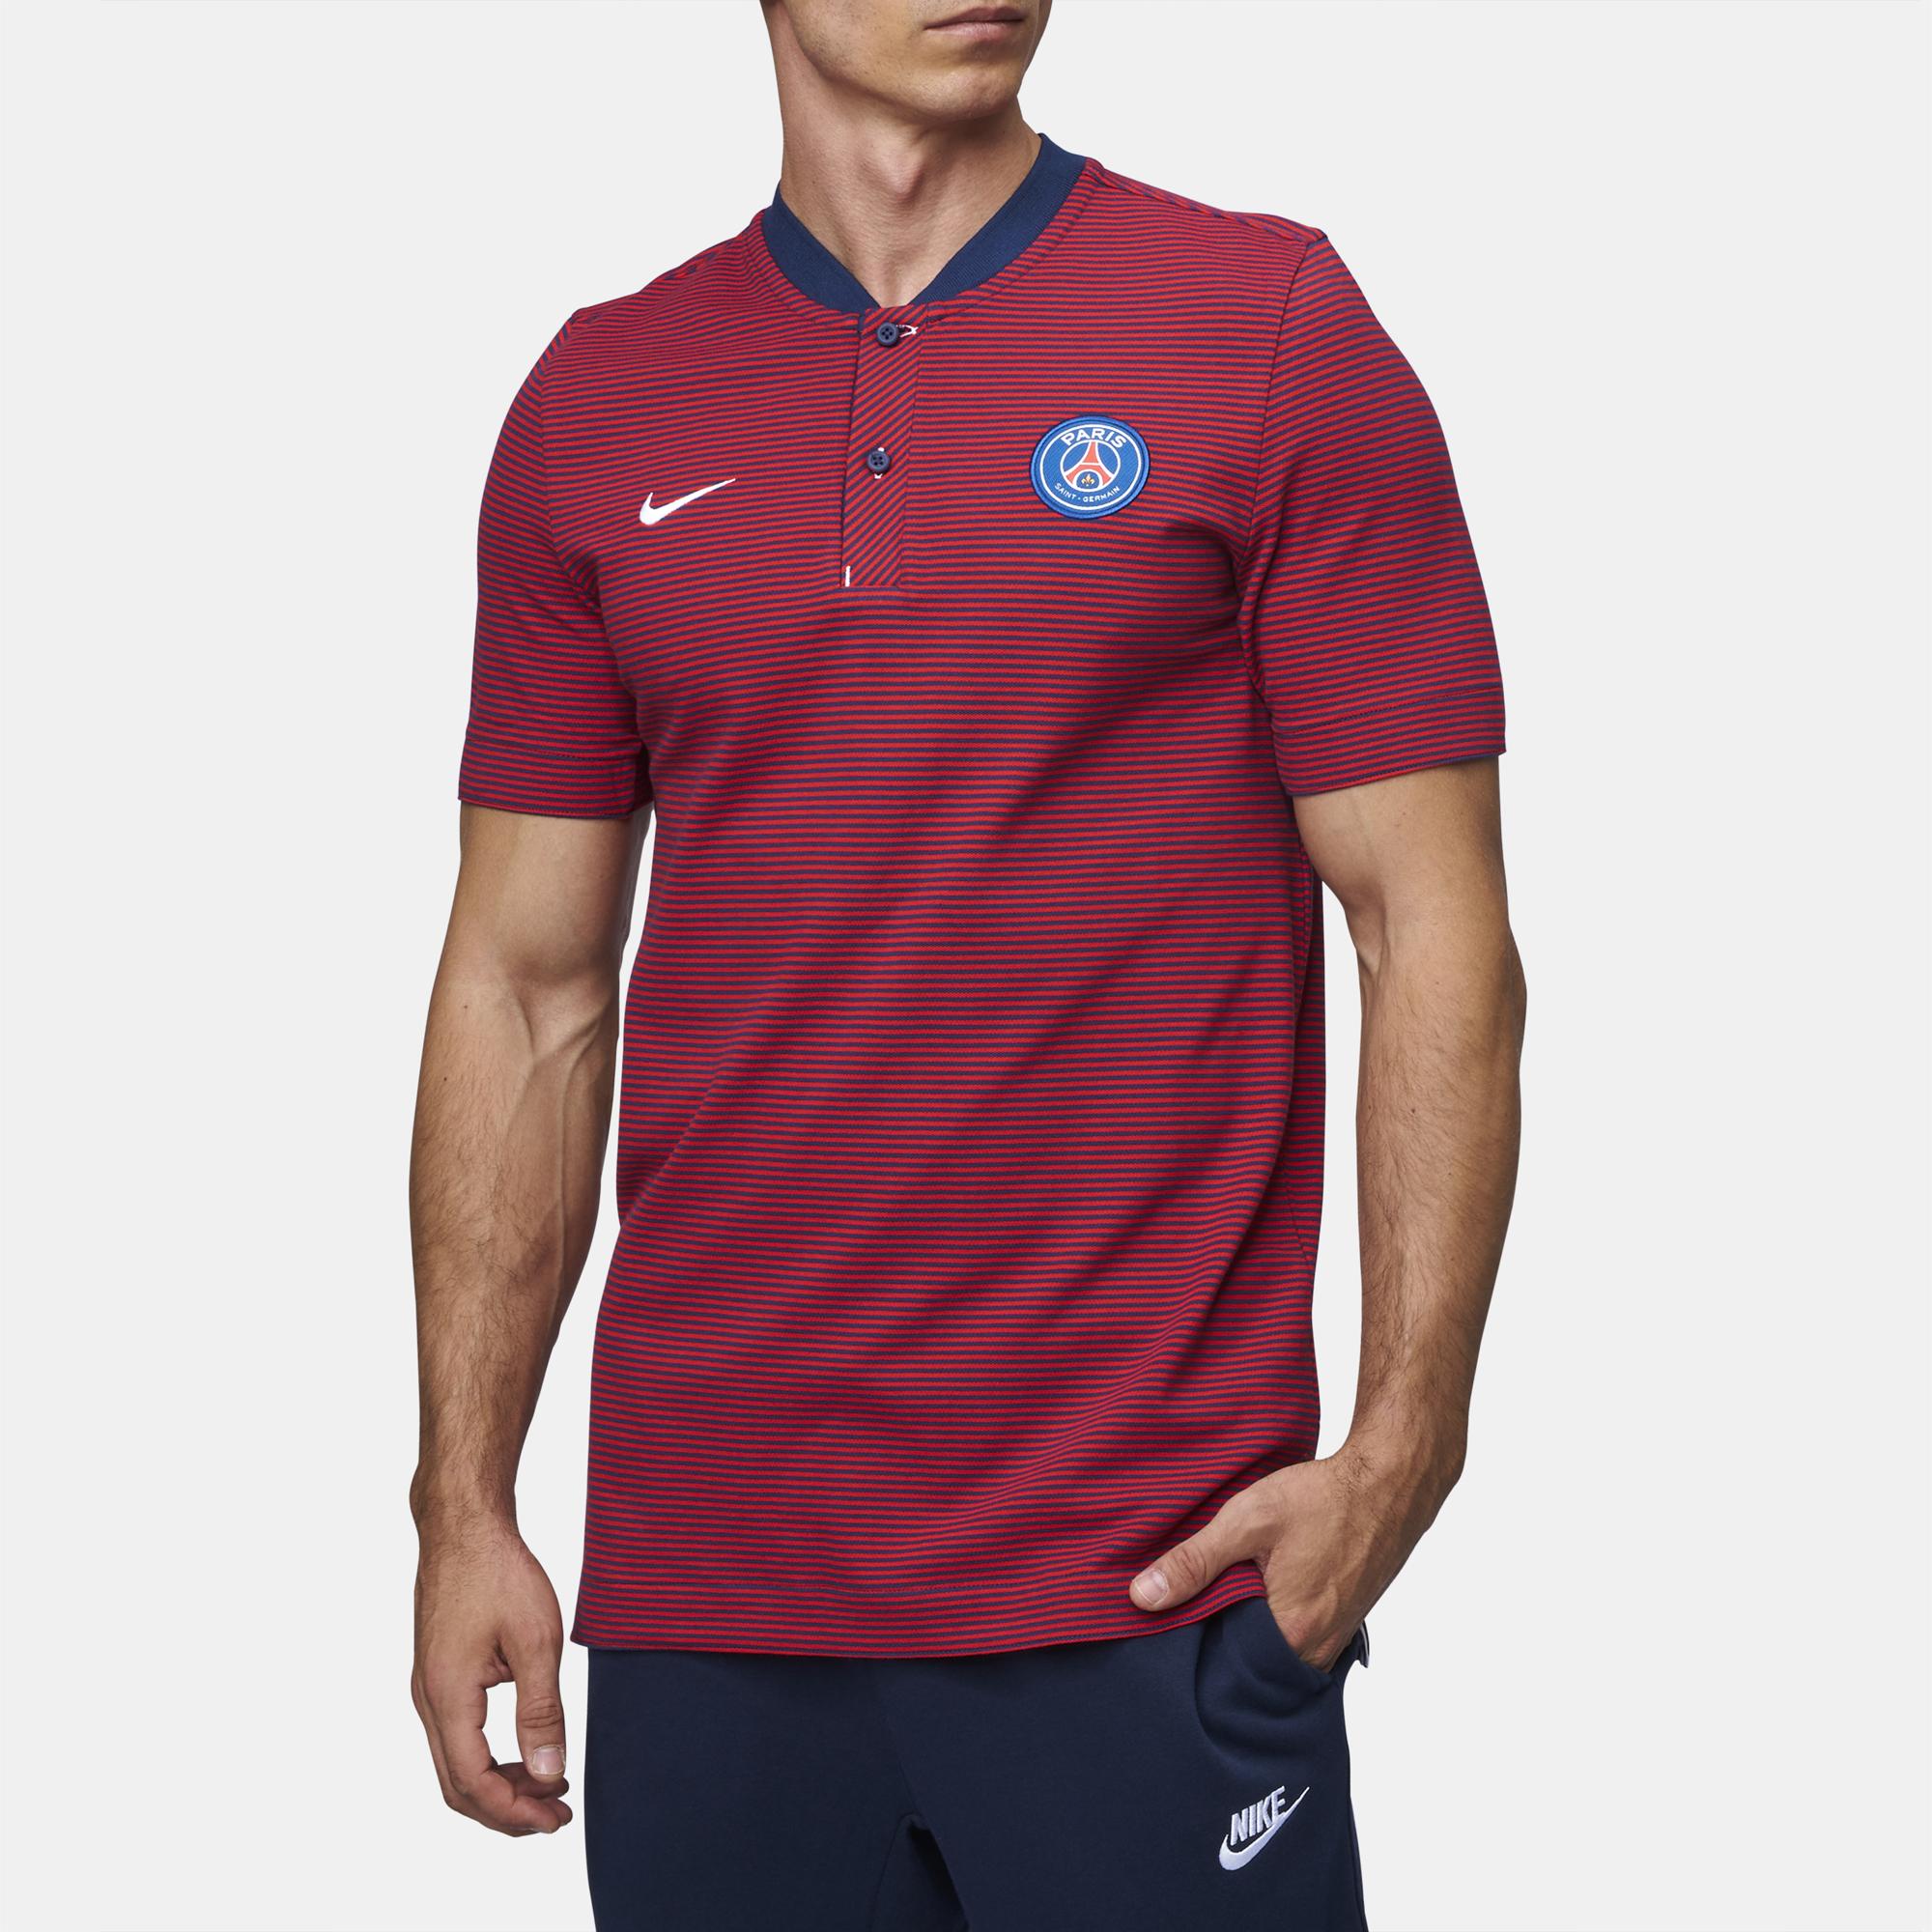 9ce3f29f1 Shop Blue Nike Paris Saint-Germain Modern Authentic Grand Slam Polo T-Shirt  for Mens by Nike | SSS